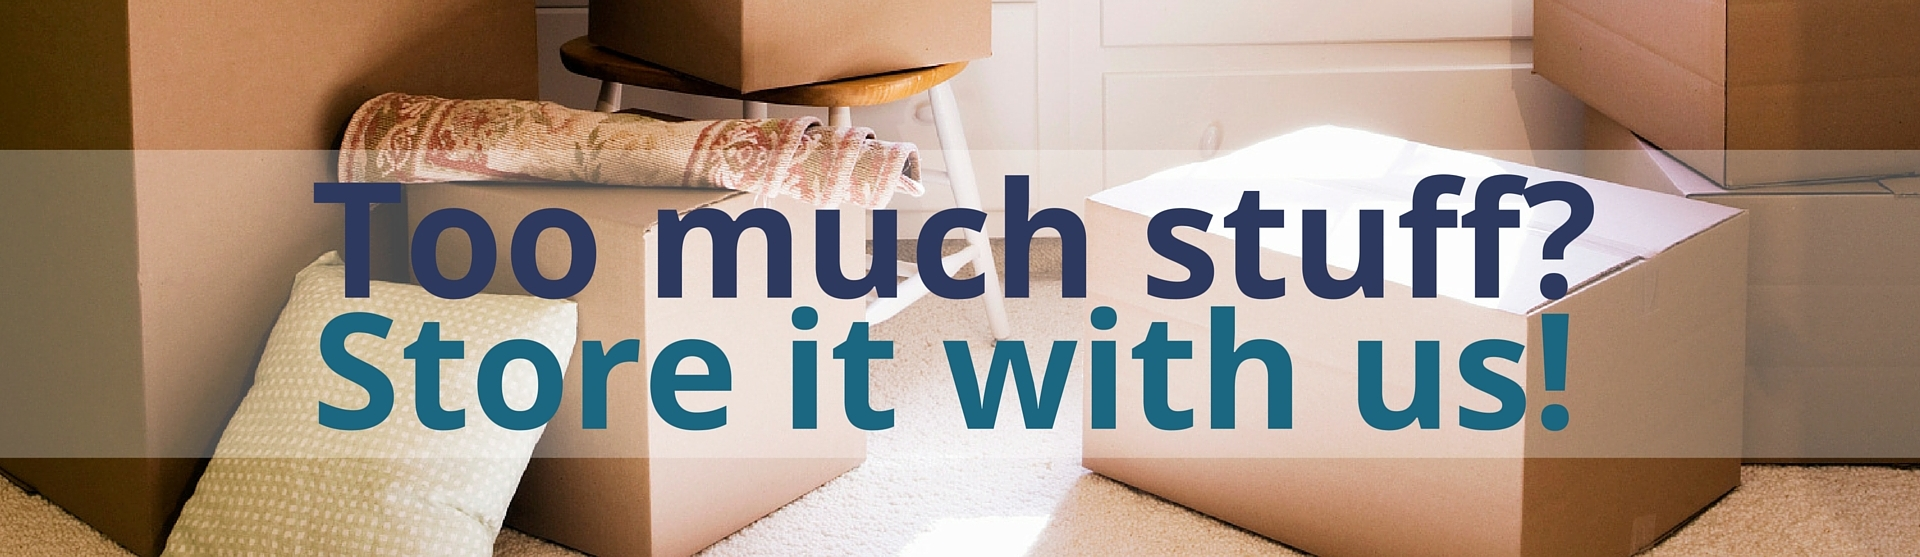 Self-Storage; Avondale; Short Term Rent; Long Term Rent; Large Storage Units; Small Storage Units; Month-to-Month Rentals; Lowest Rates in Town; Cheap Storage Units, Cheap Self Storage, cheap storage, storage rental, storage units; Mini Storage; Escondido; Temecula; Chandler; Bullhead; Kingman; Tucsan; West Jordan;